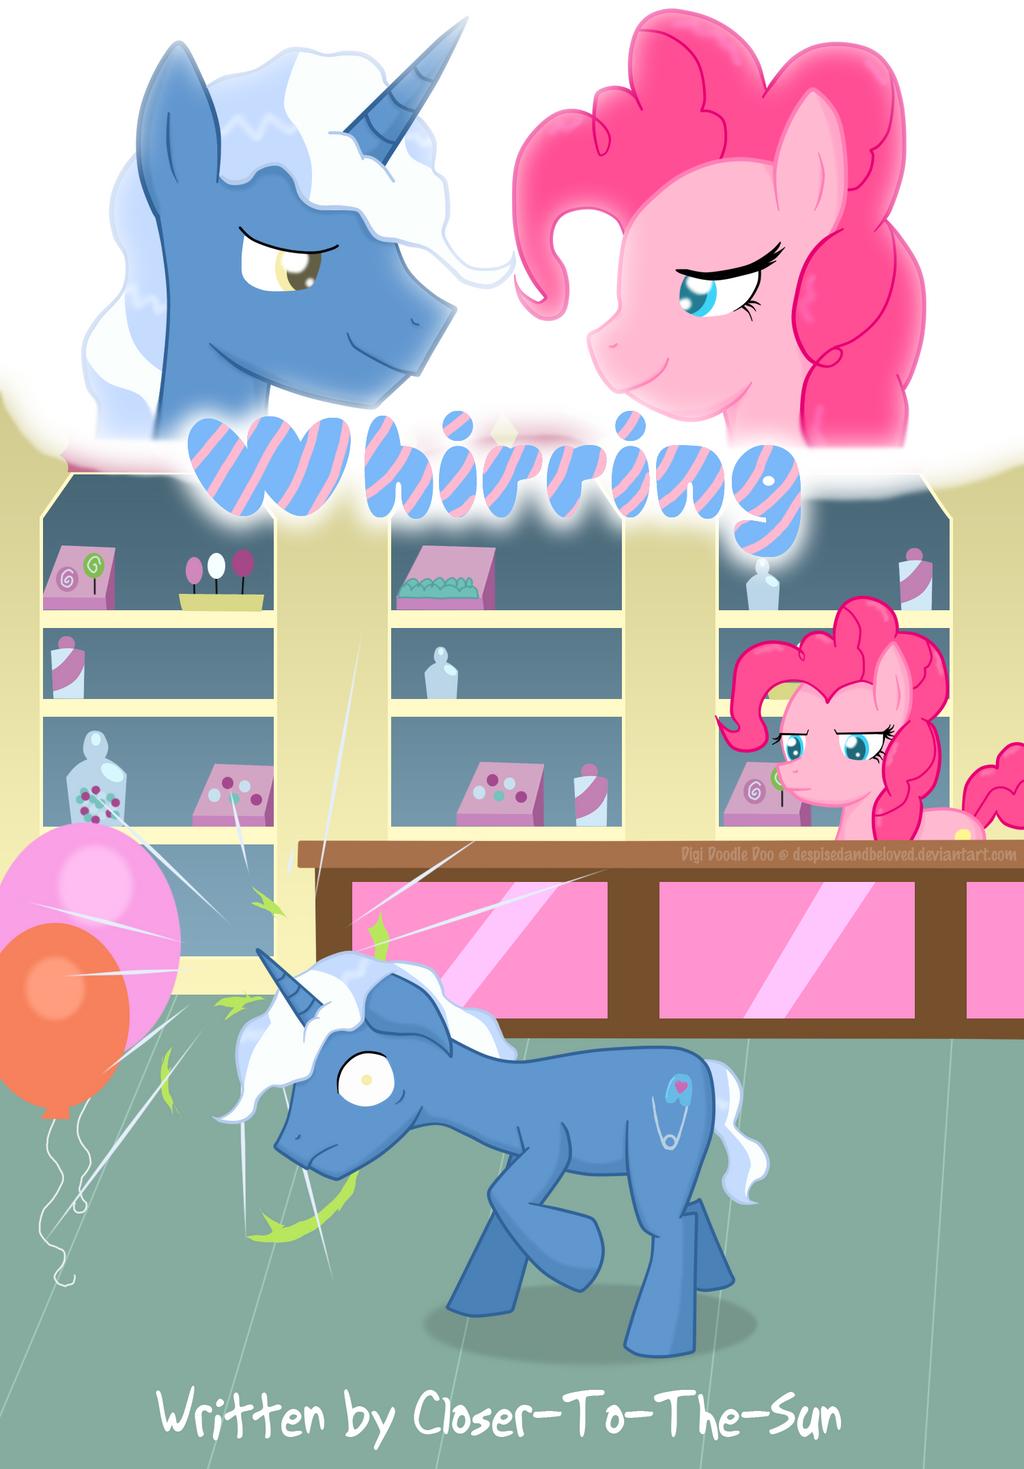 whirring_poster_by_despisedandbeloved-d4